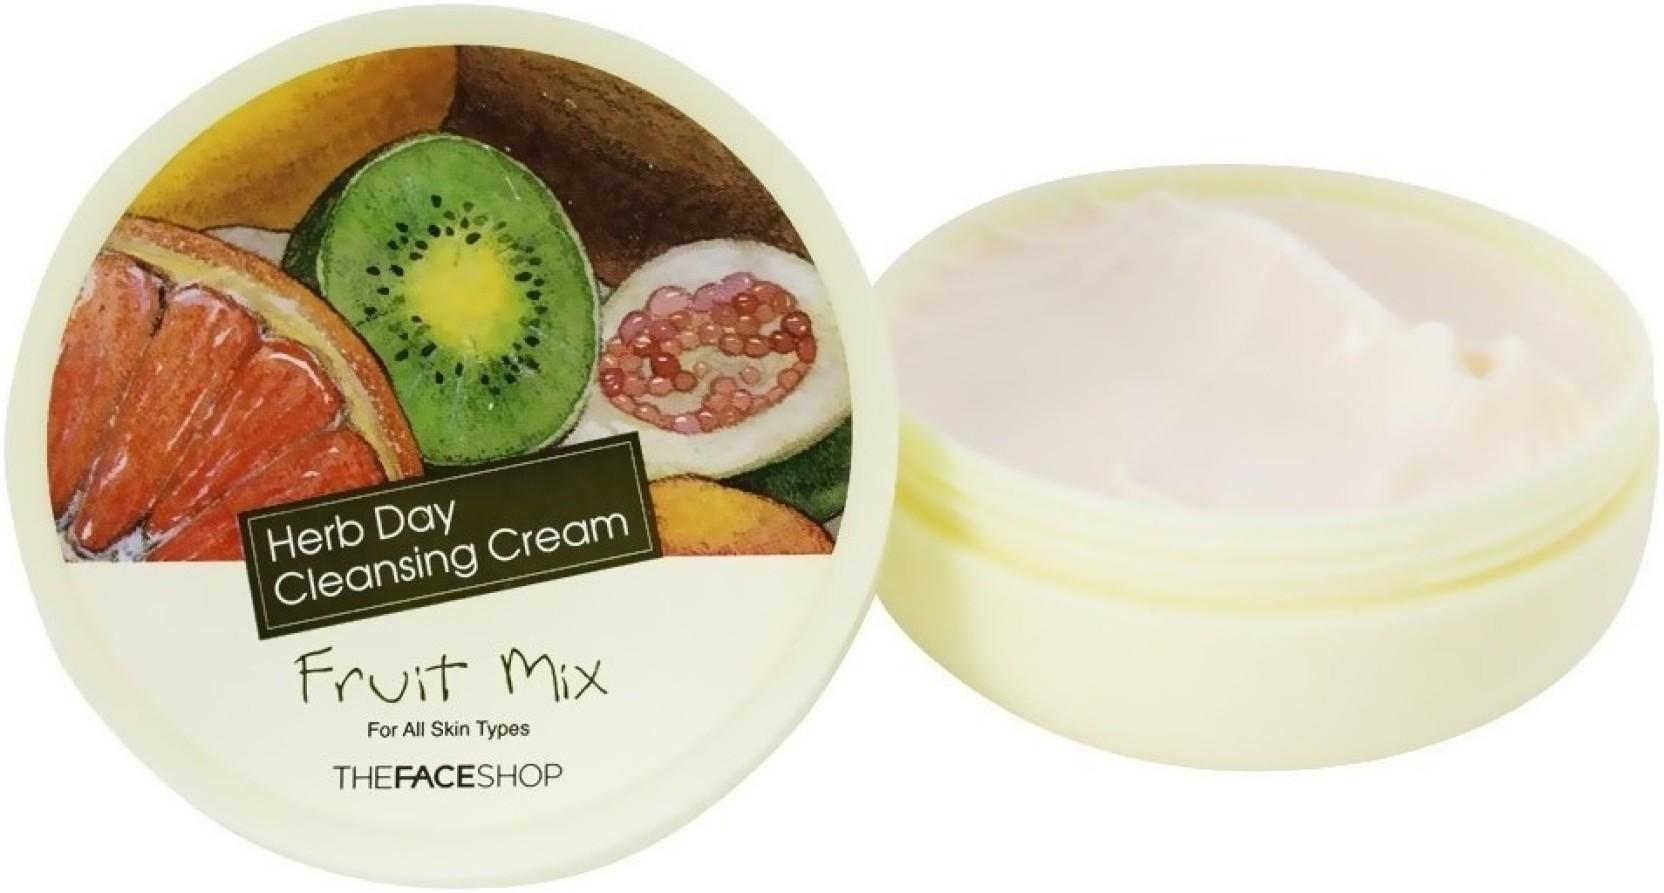 Очищающий крем для снятия макияжа The Face Shop Herb Day Cleansing Cream Fruit Mix - 150 мл